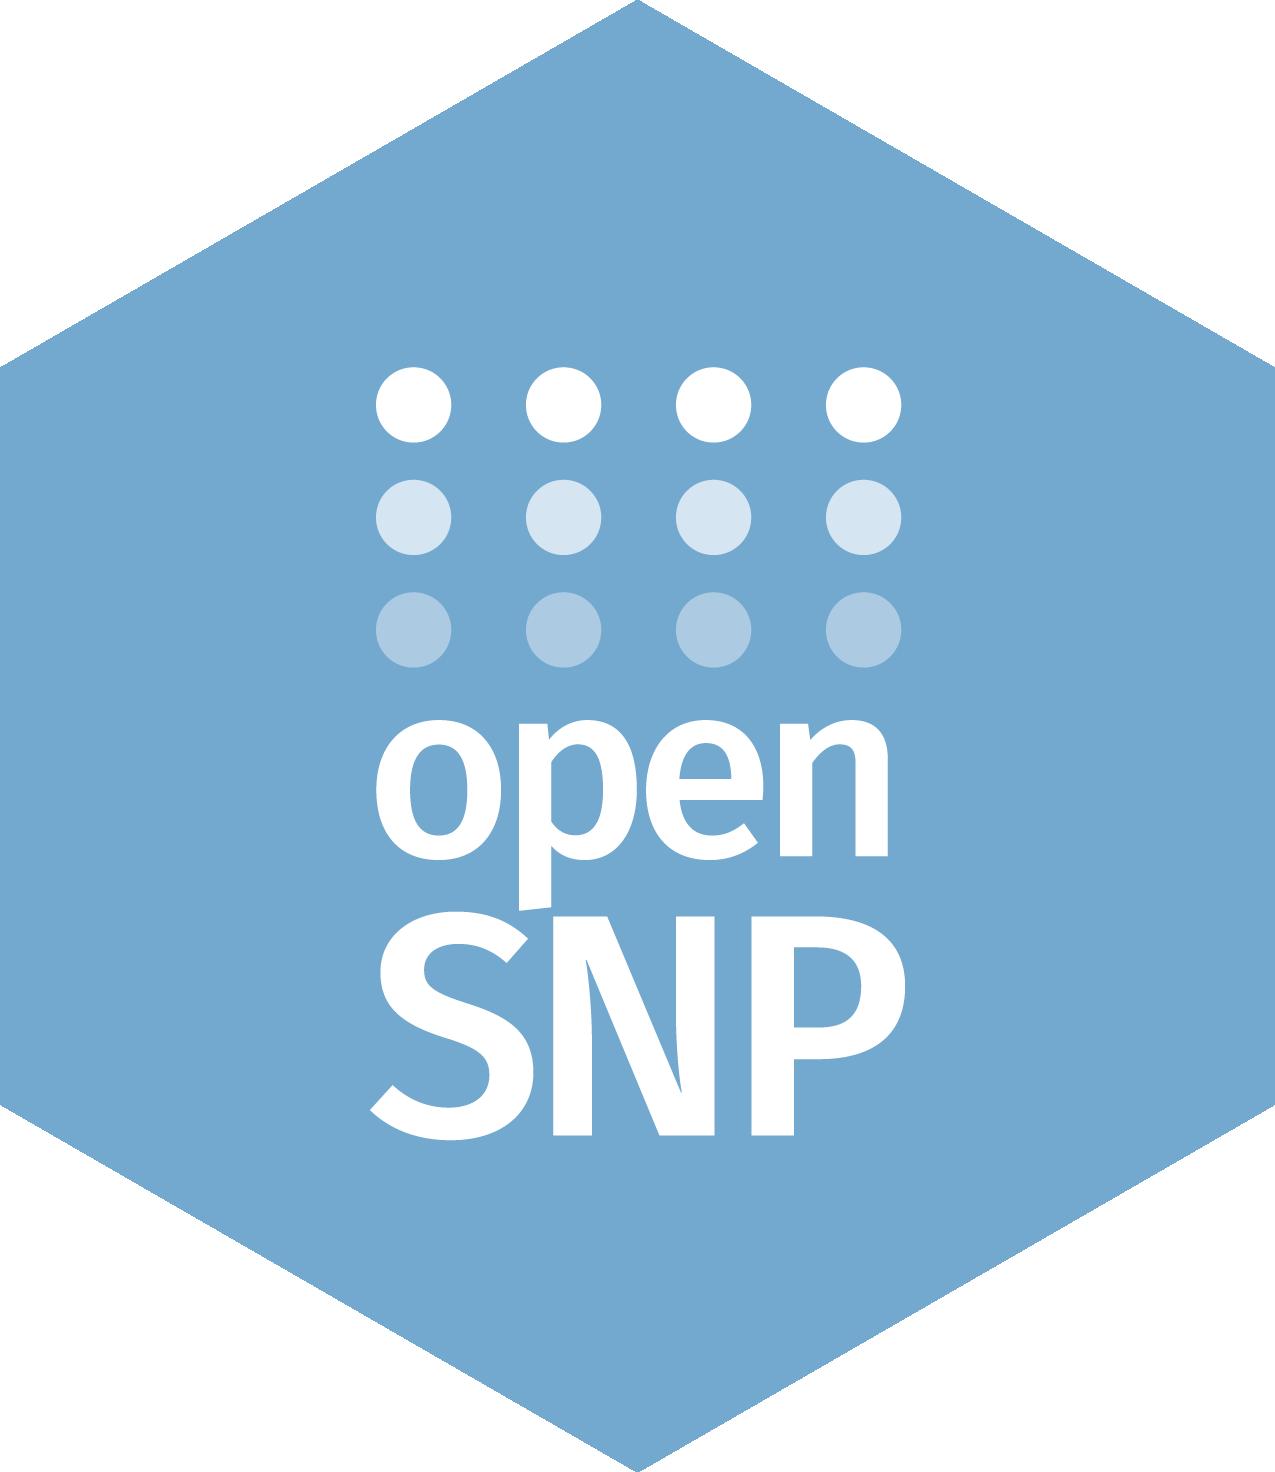 openSNP